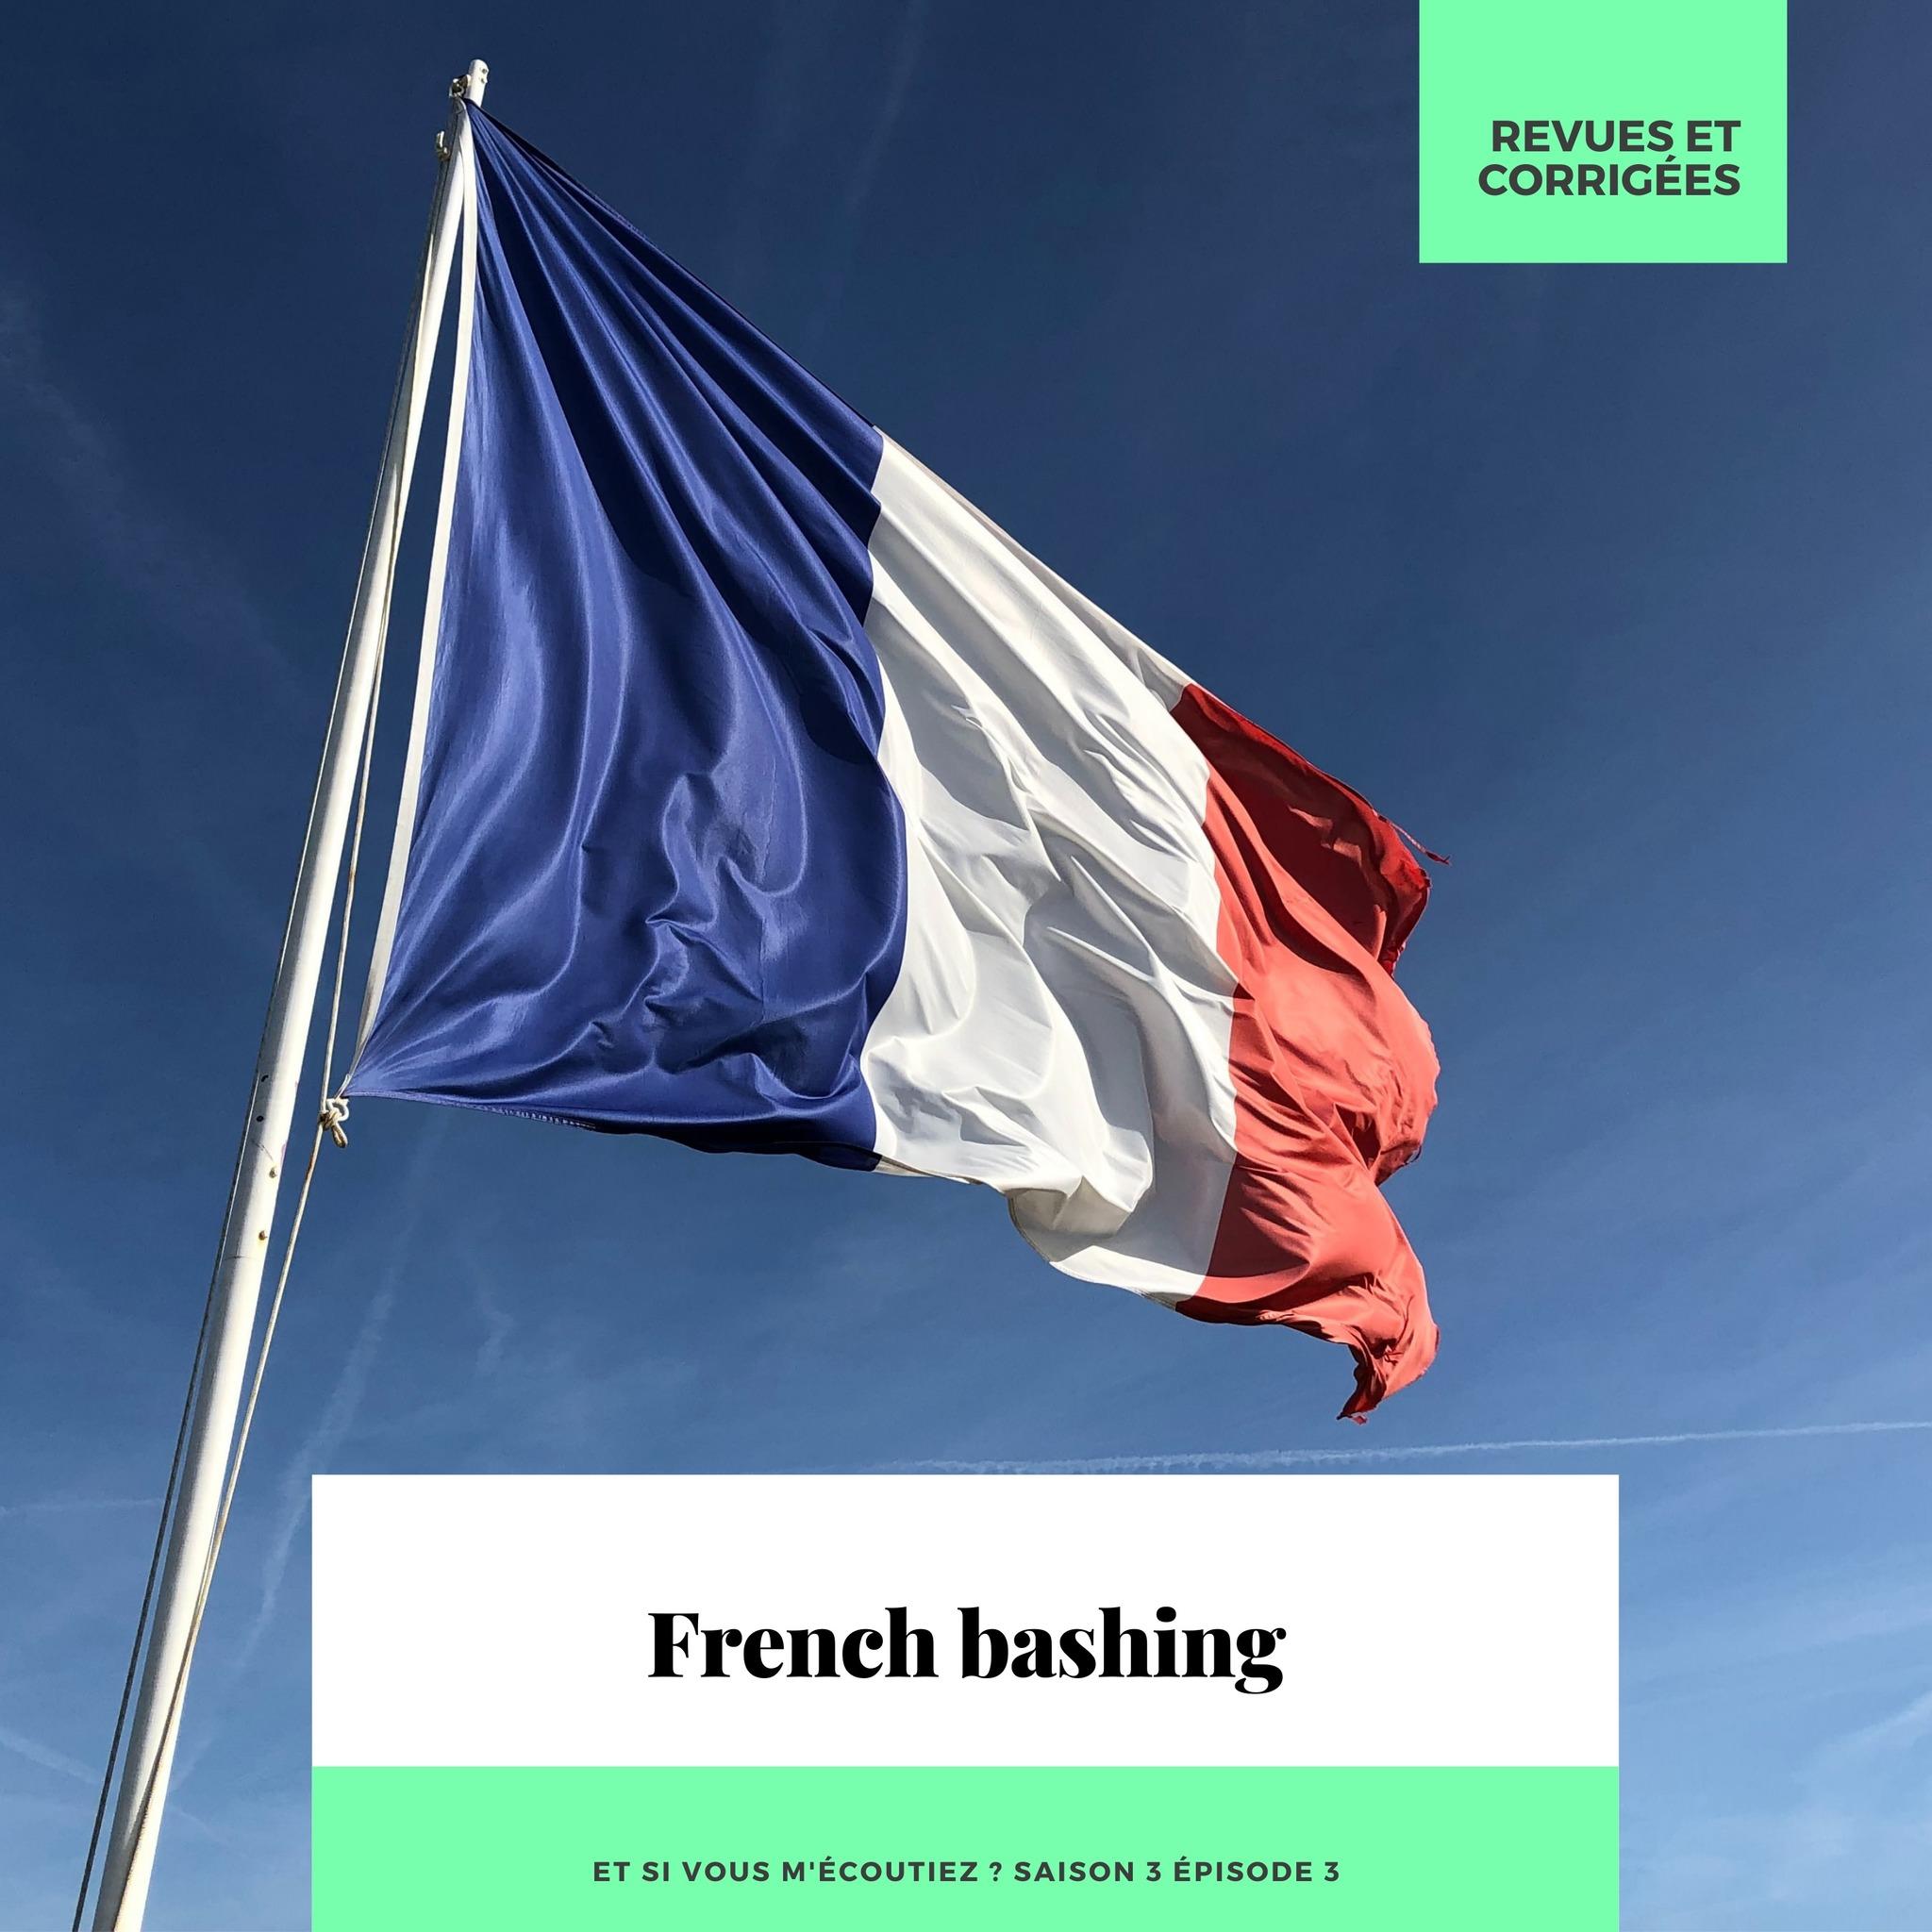 S3E003 – French bashing